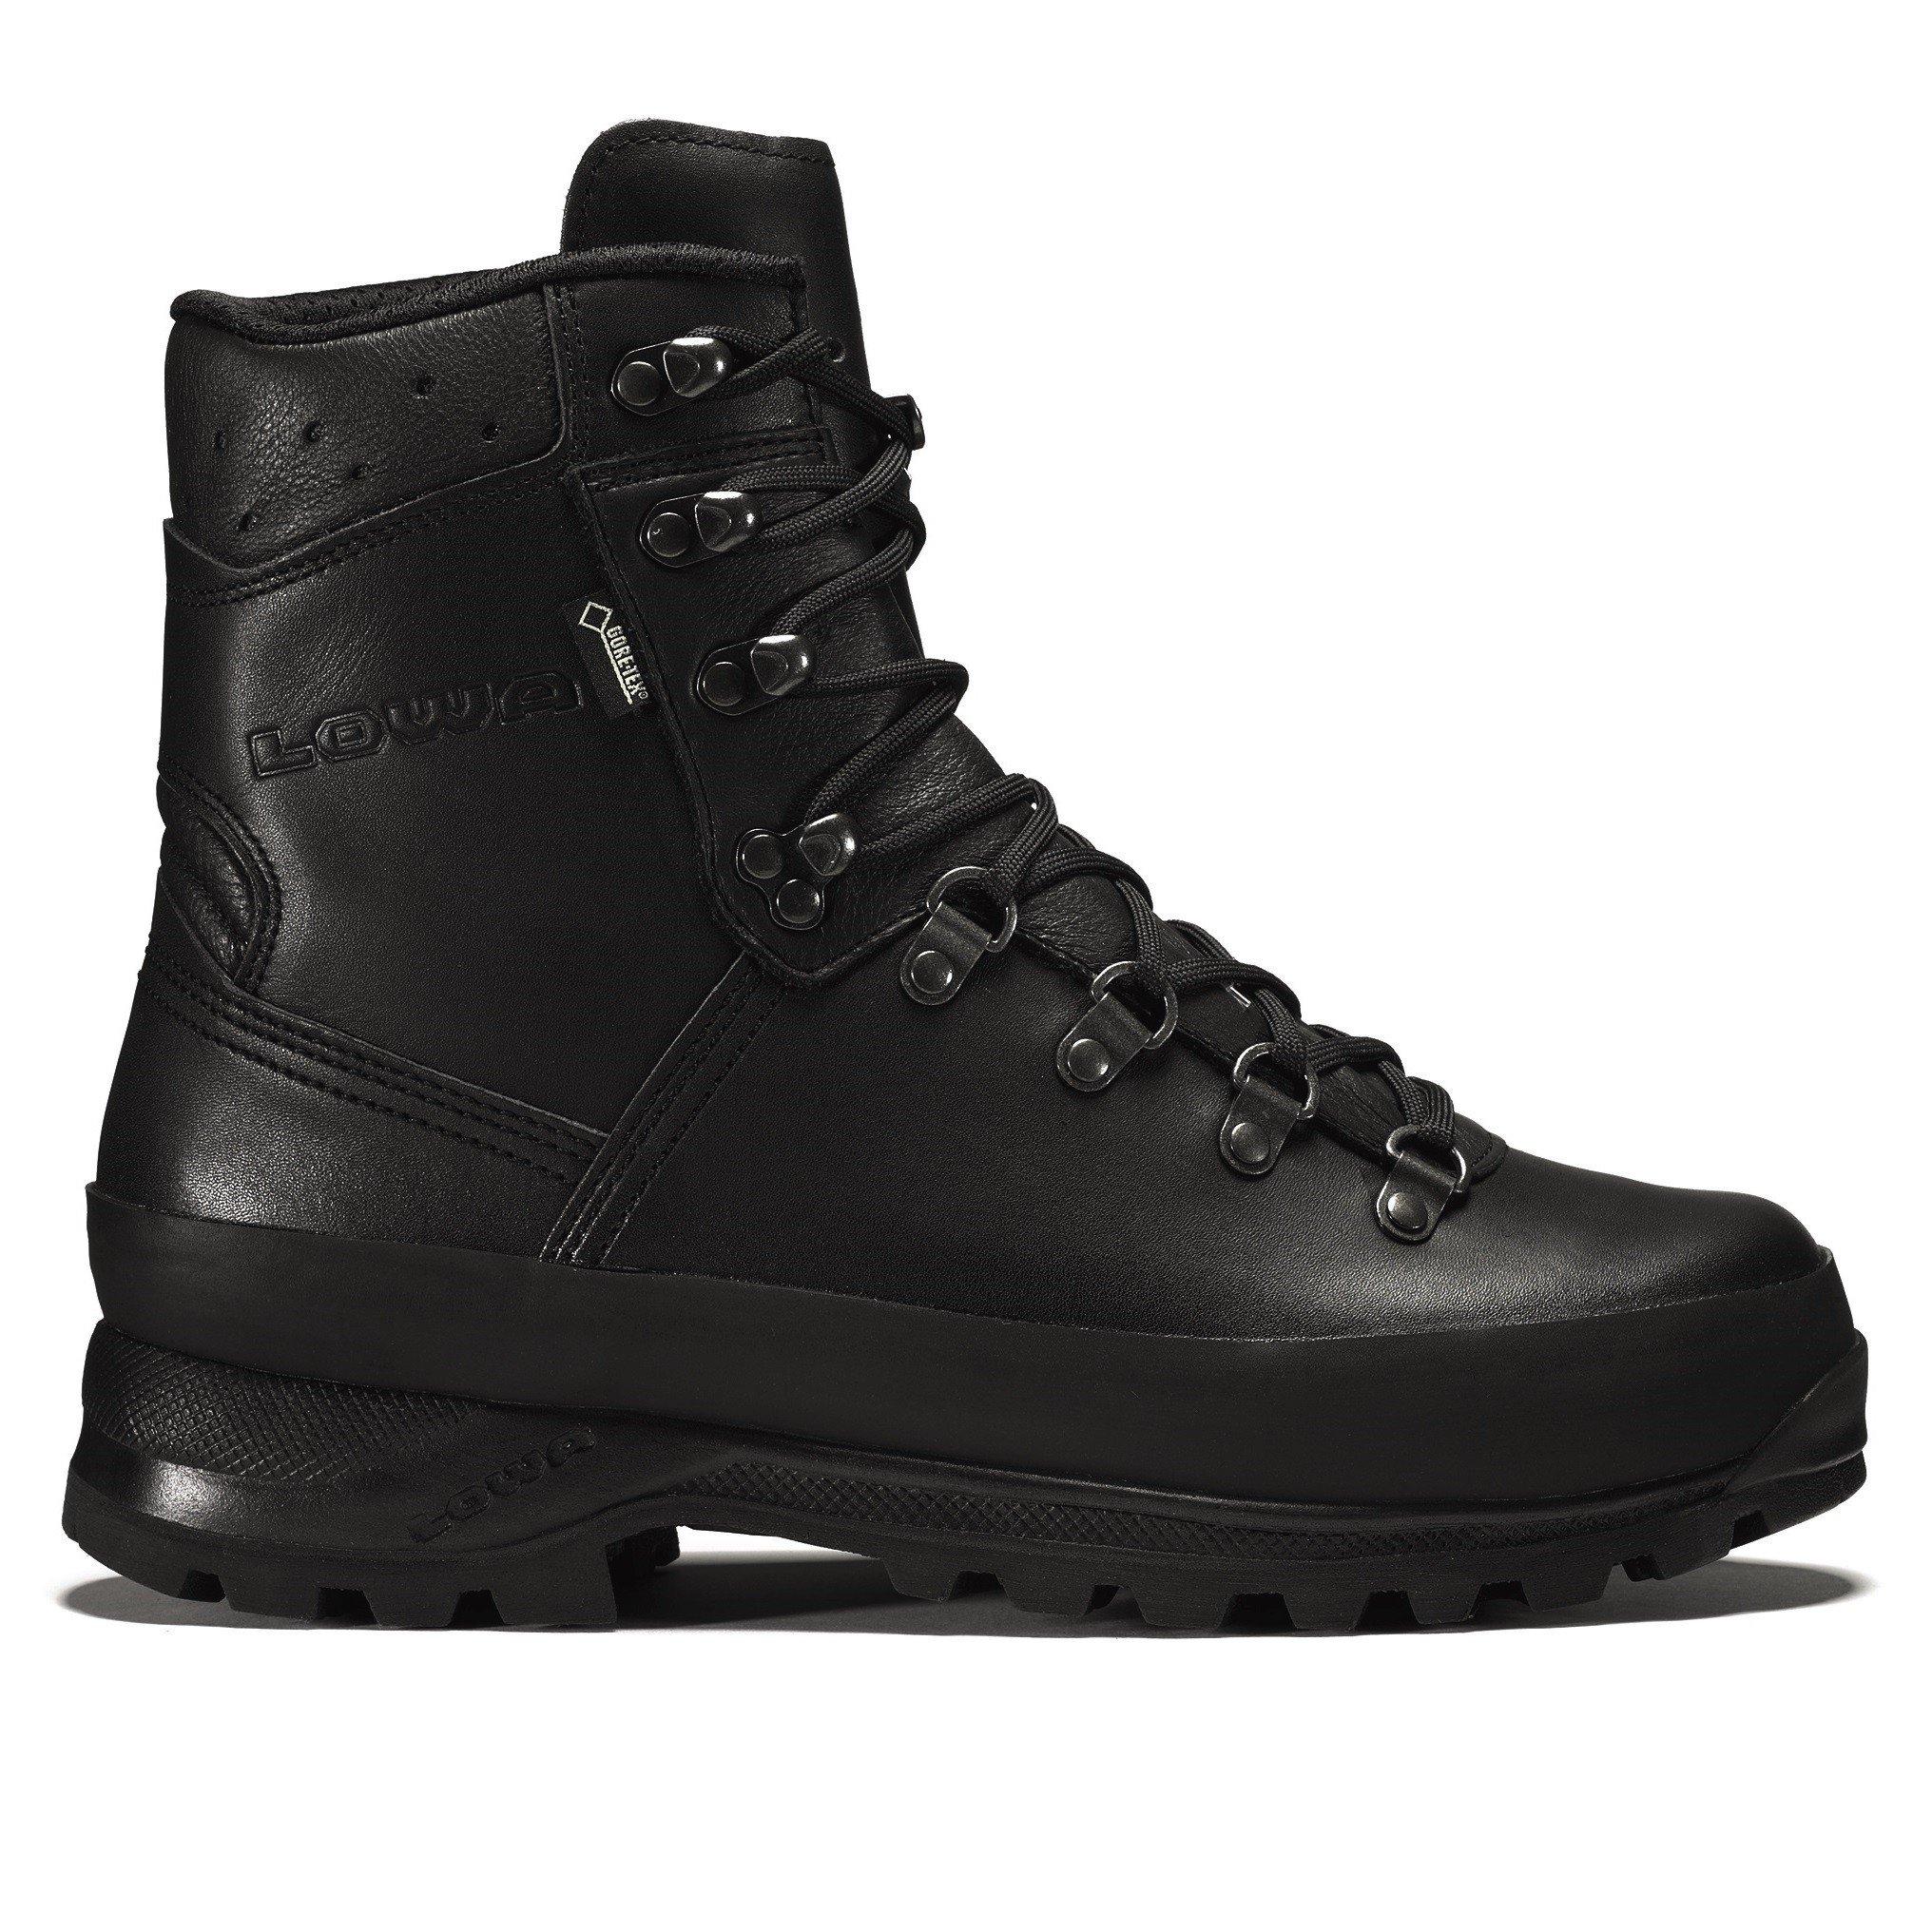 Lowa Mountain Boots GTX Black